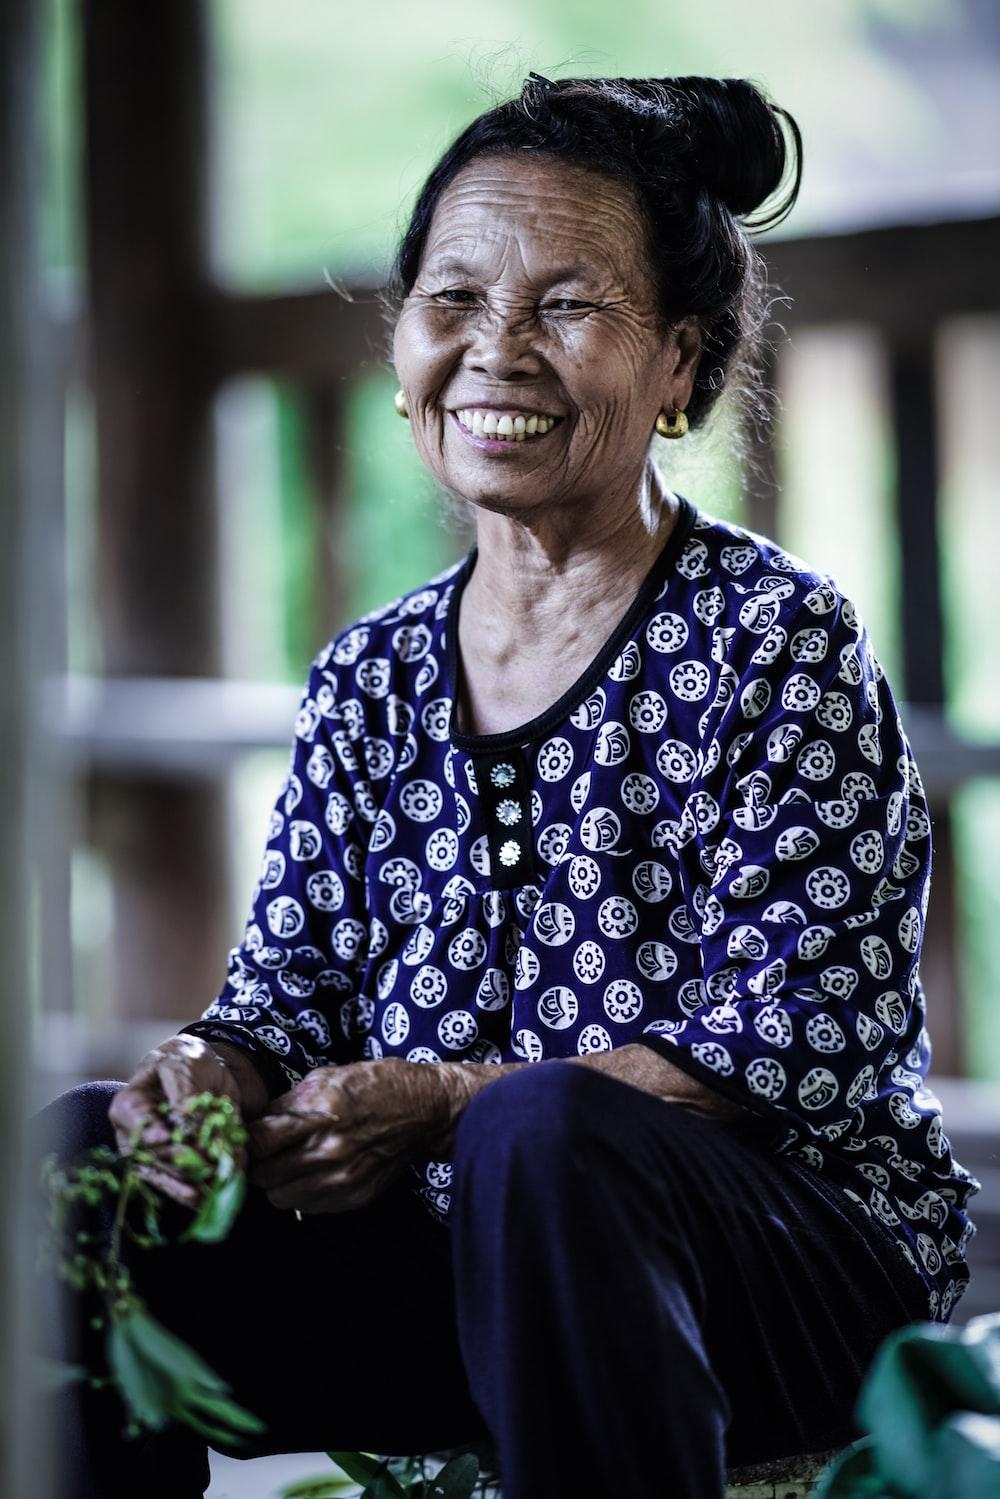 woman sitting near handrail